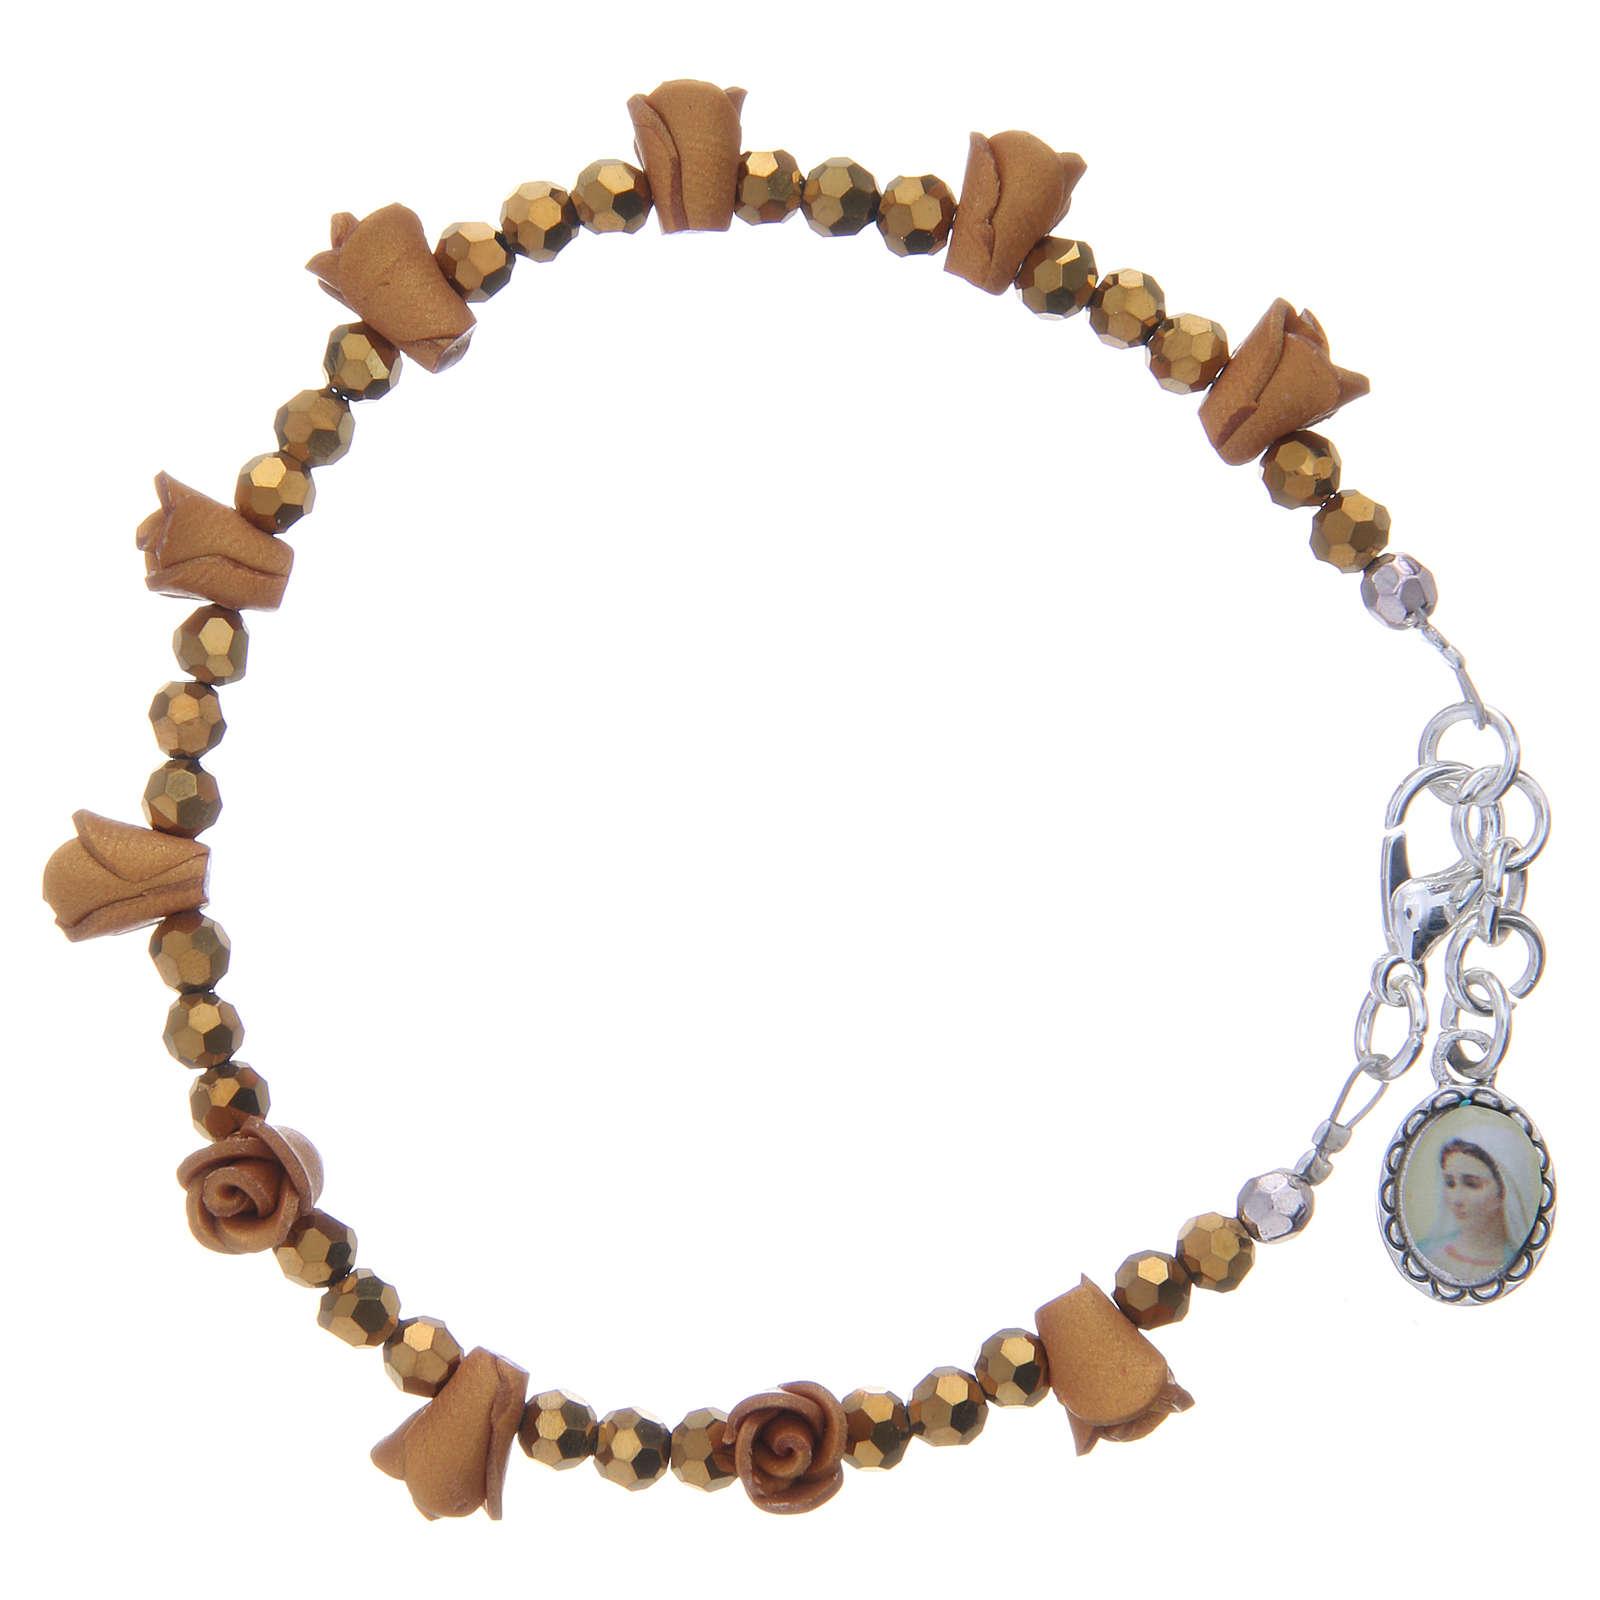 Bracciale rosario Medjugorje color ambra 4